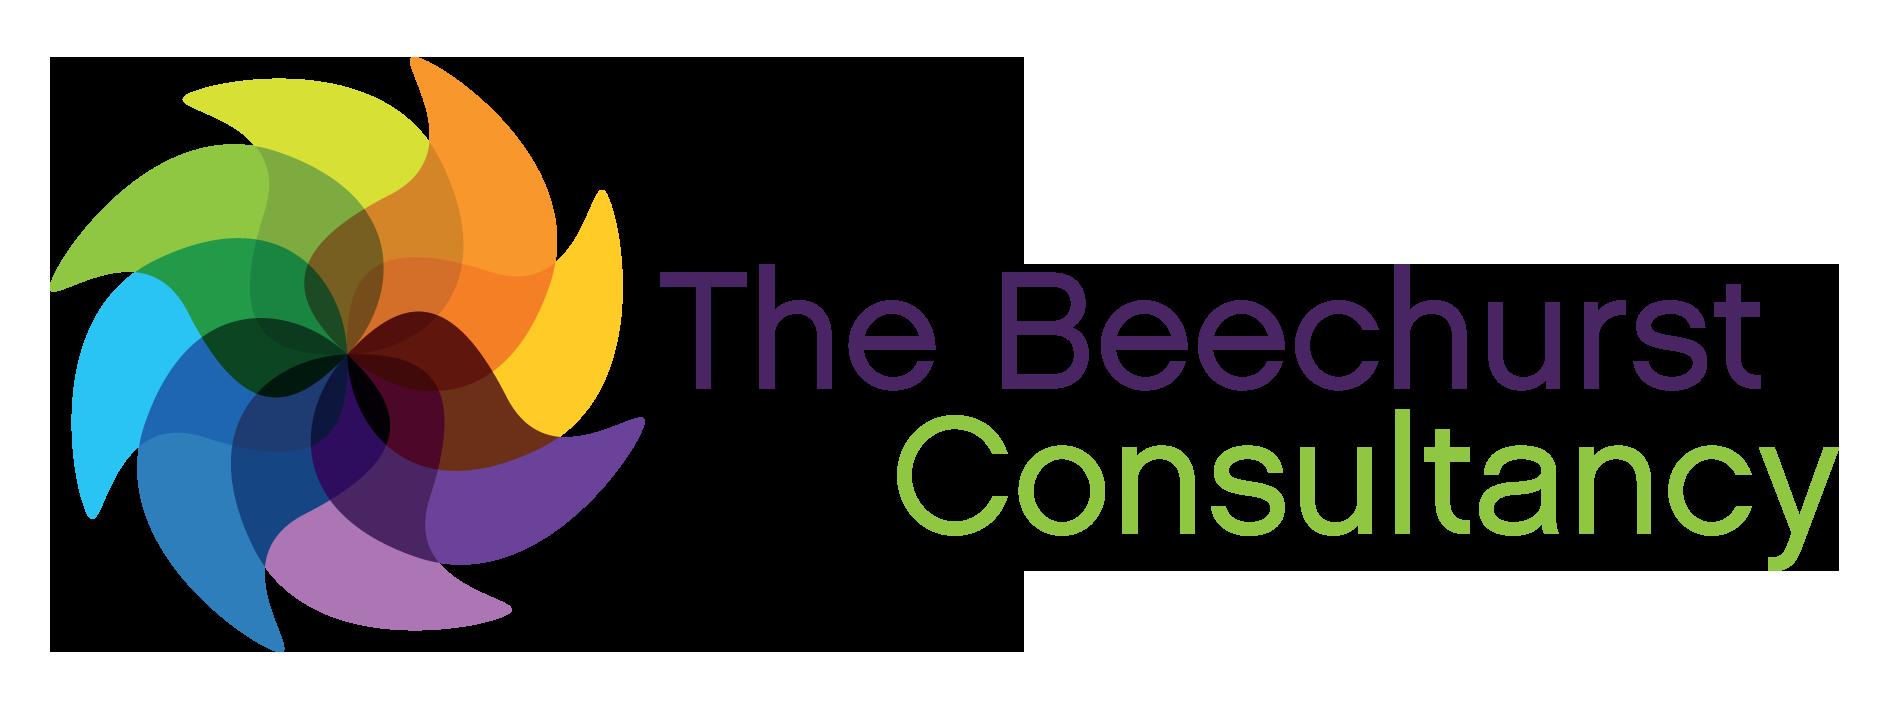 The Beechurst Consultancy